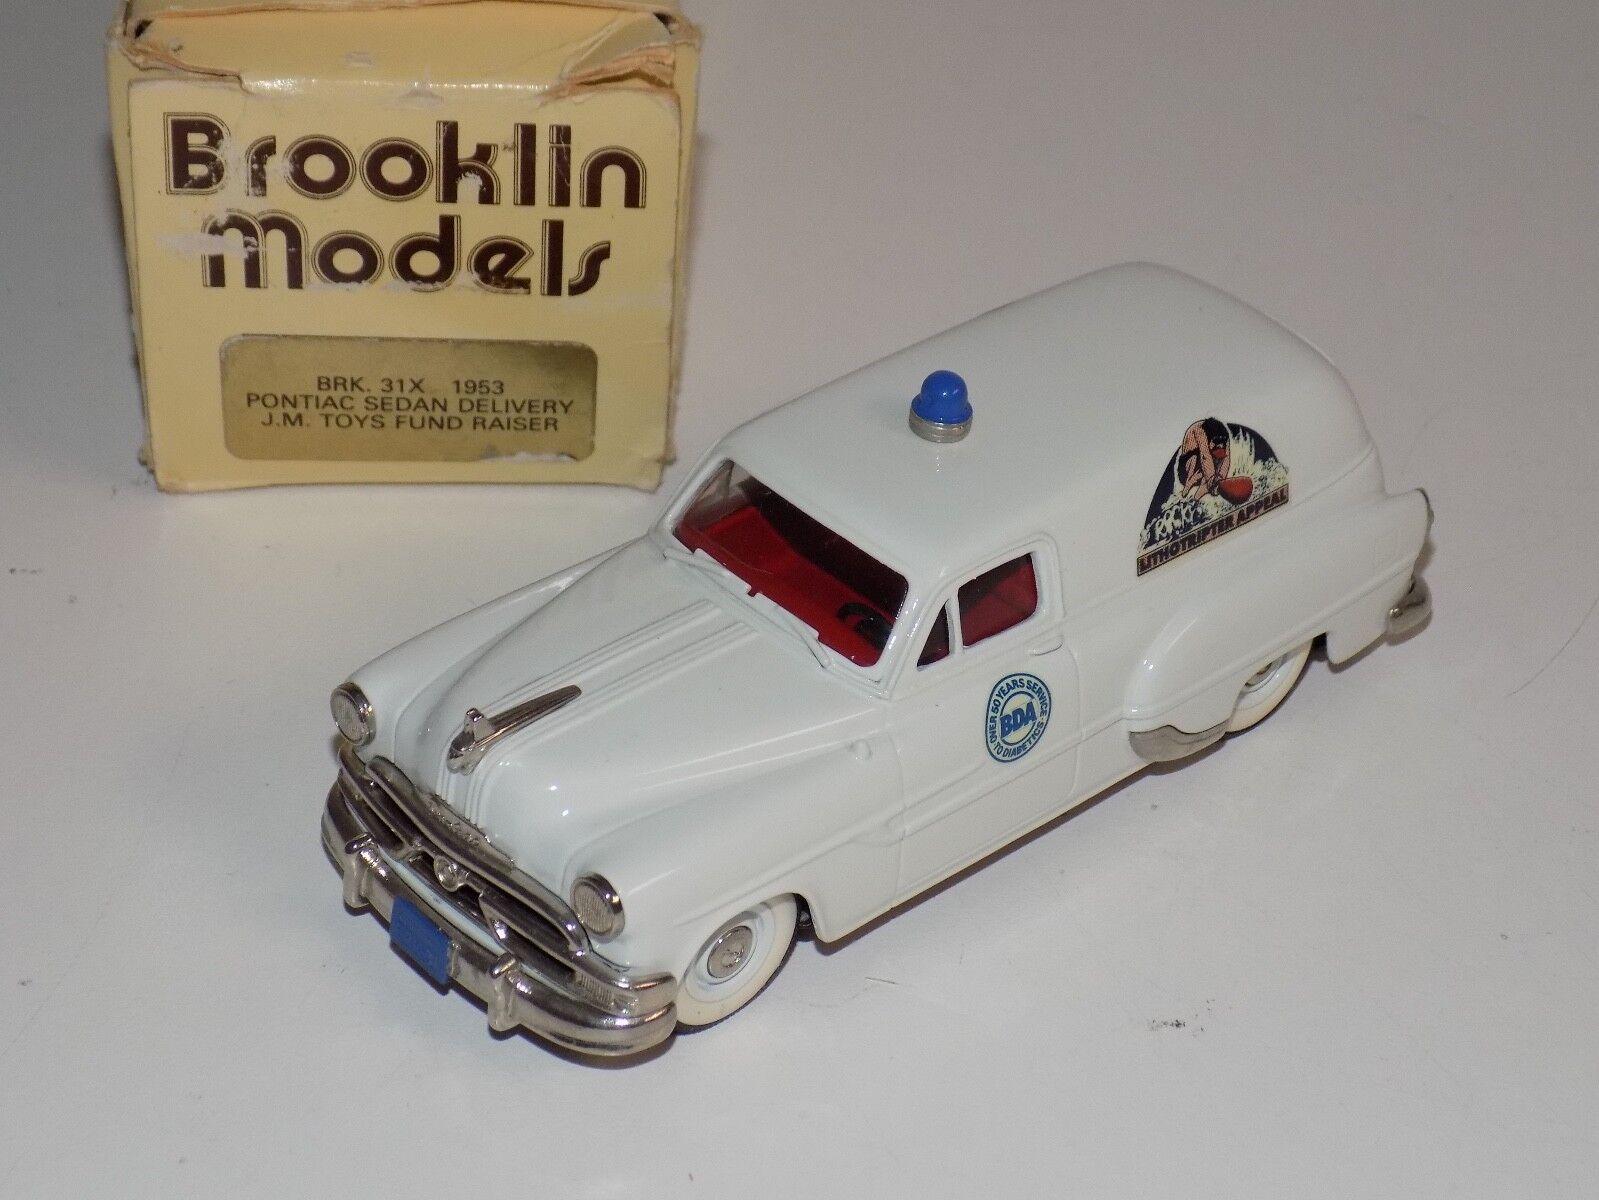 1 43 BROOKLIN MODELS 1953 PONTIAC SEDAN DELIVERY J.M. jouets fonds Rais Brk31X B31